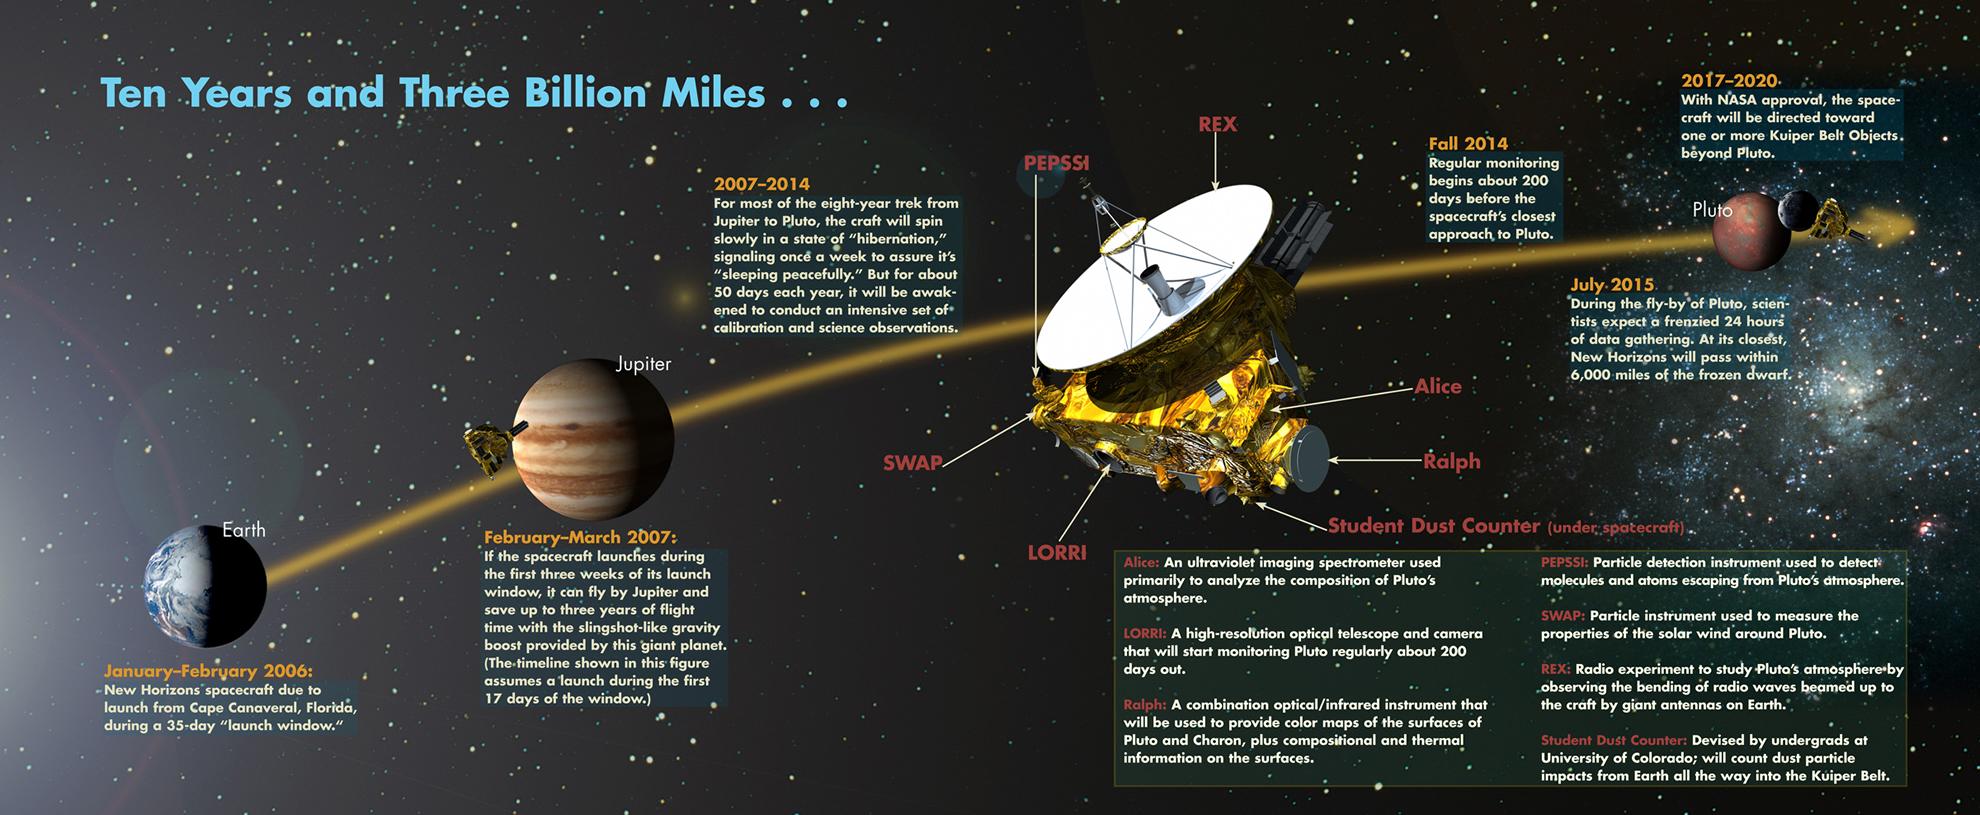 new horizons spacecraft speed - photo #40